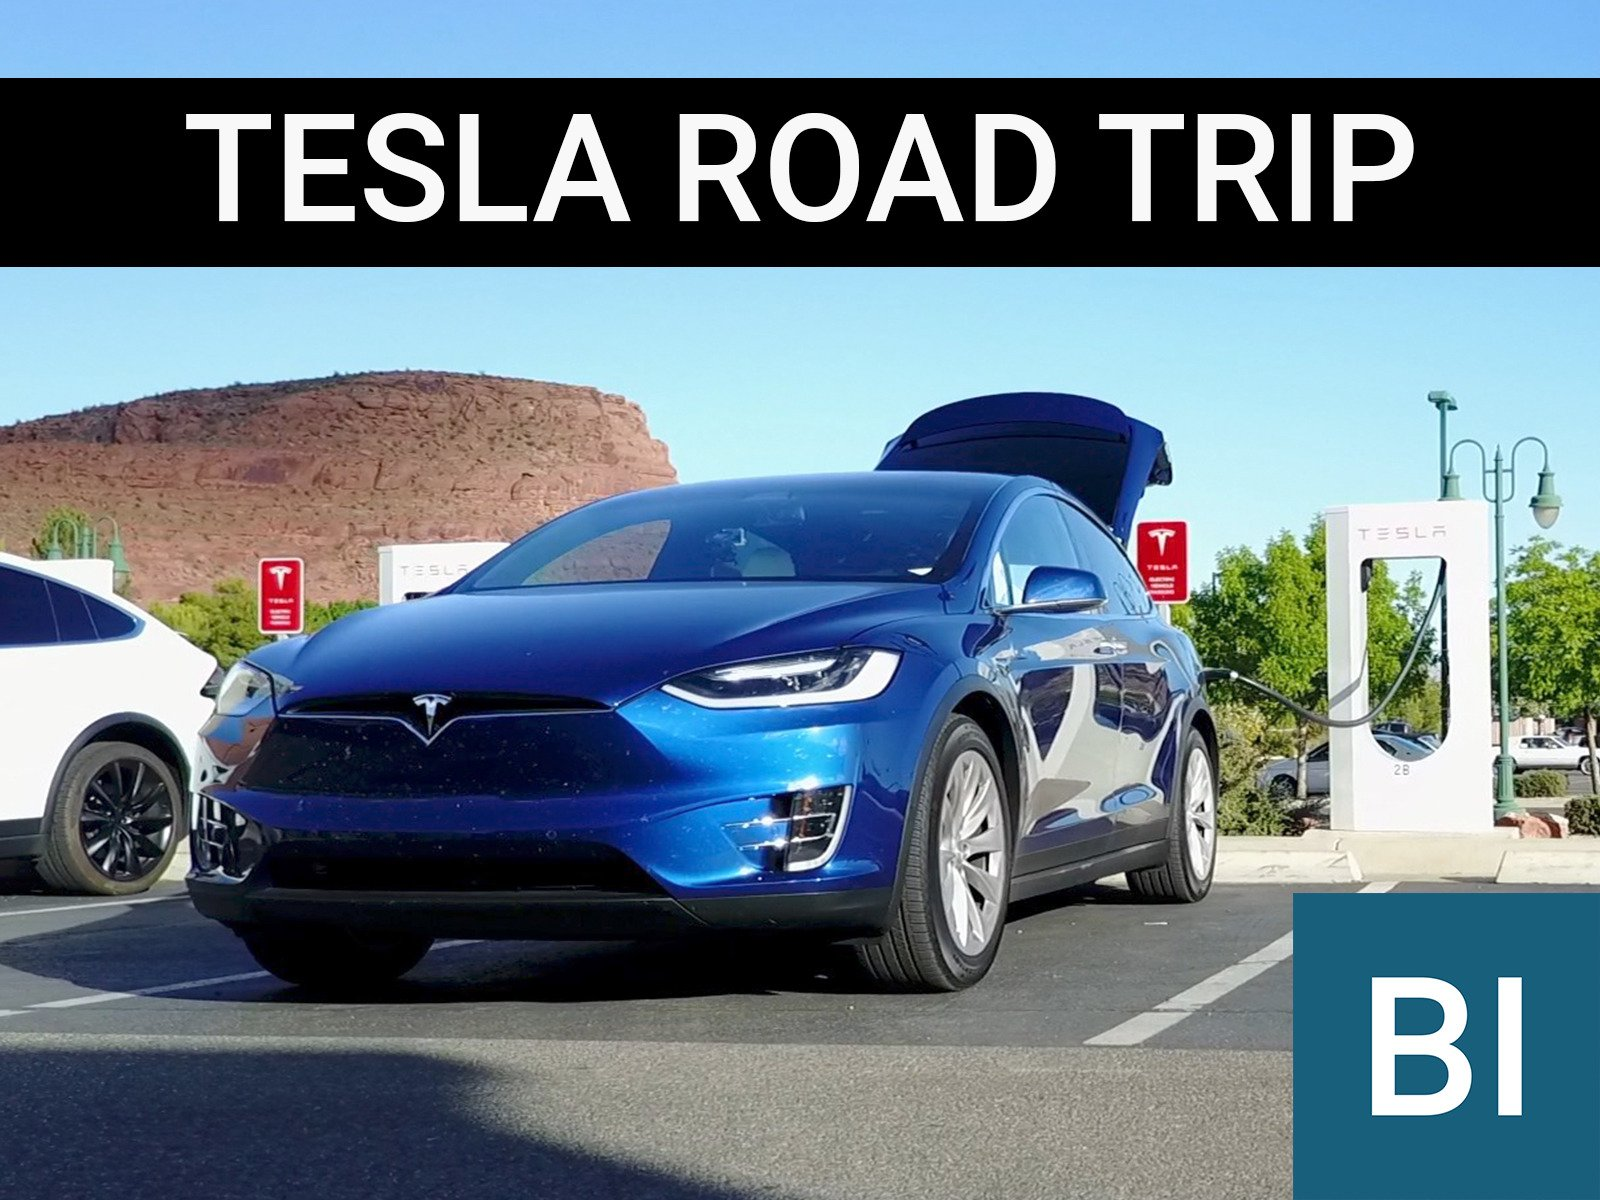 Tesla Road Trip - Season 1